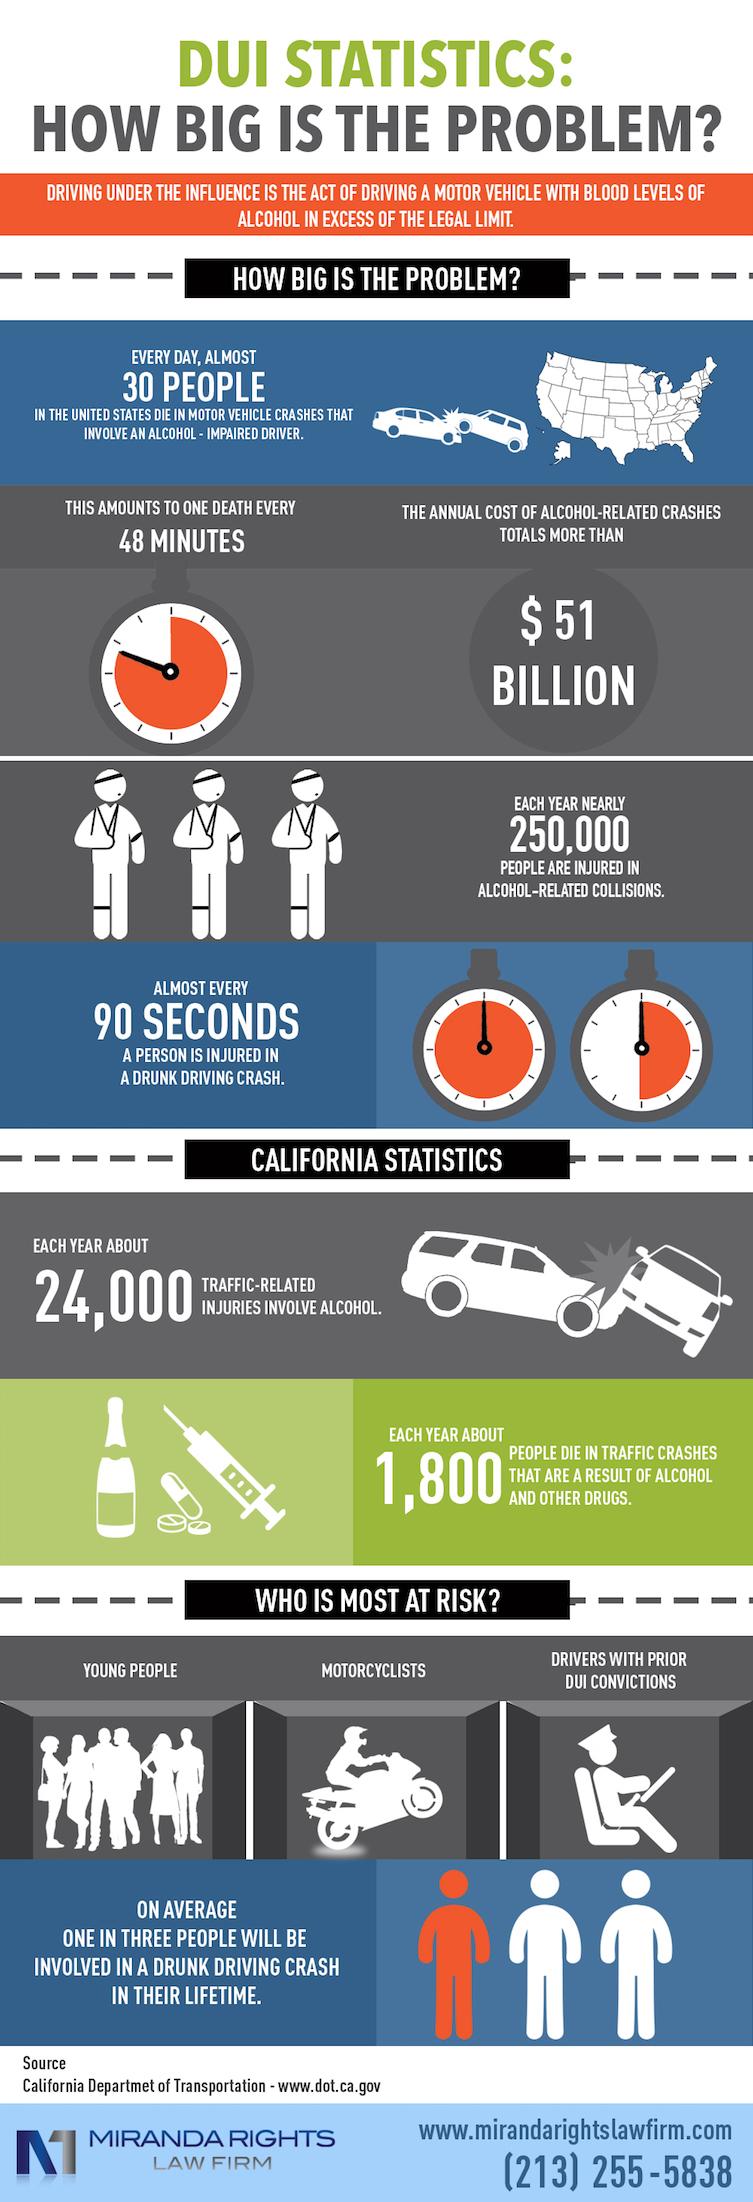 DUI Statistics How Big Is The Problem